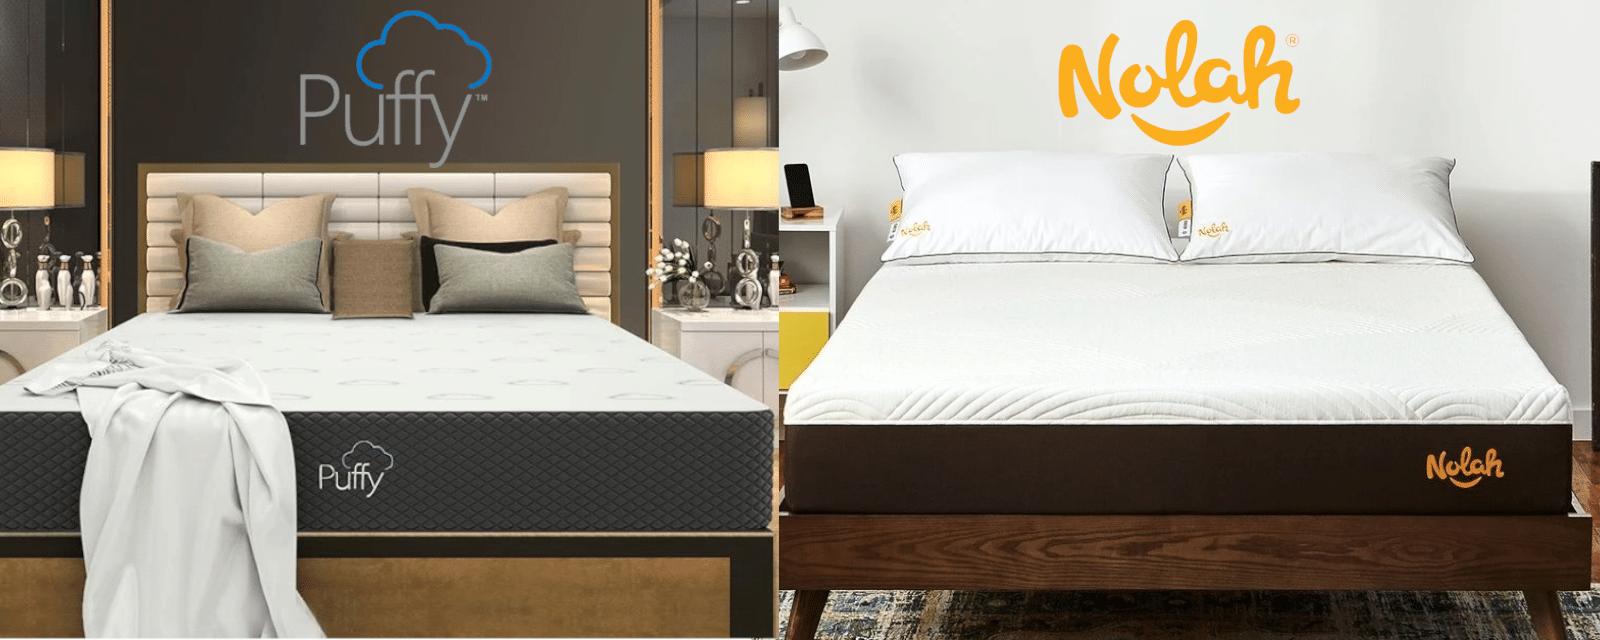 puffy vs nolah mattress comparison review